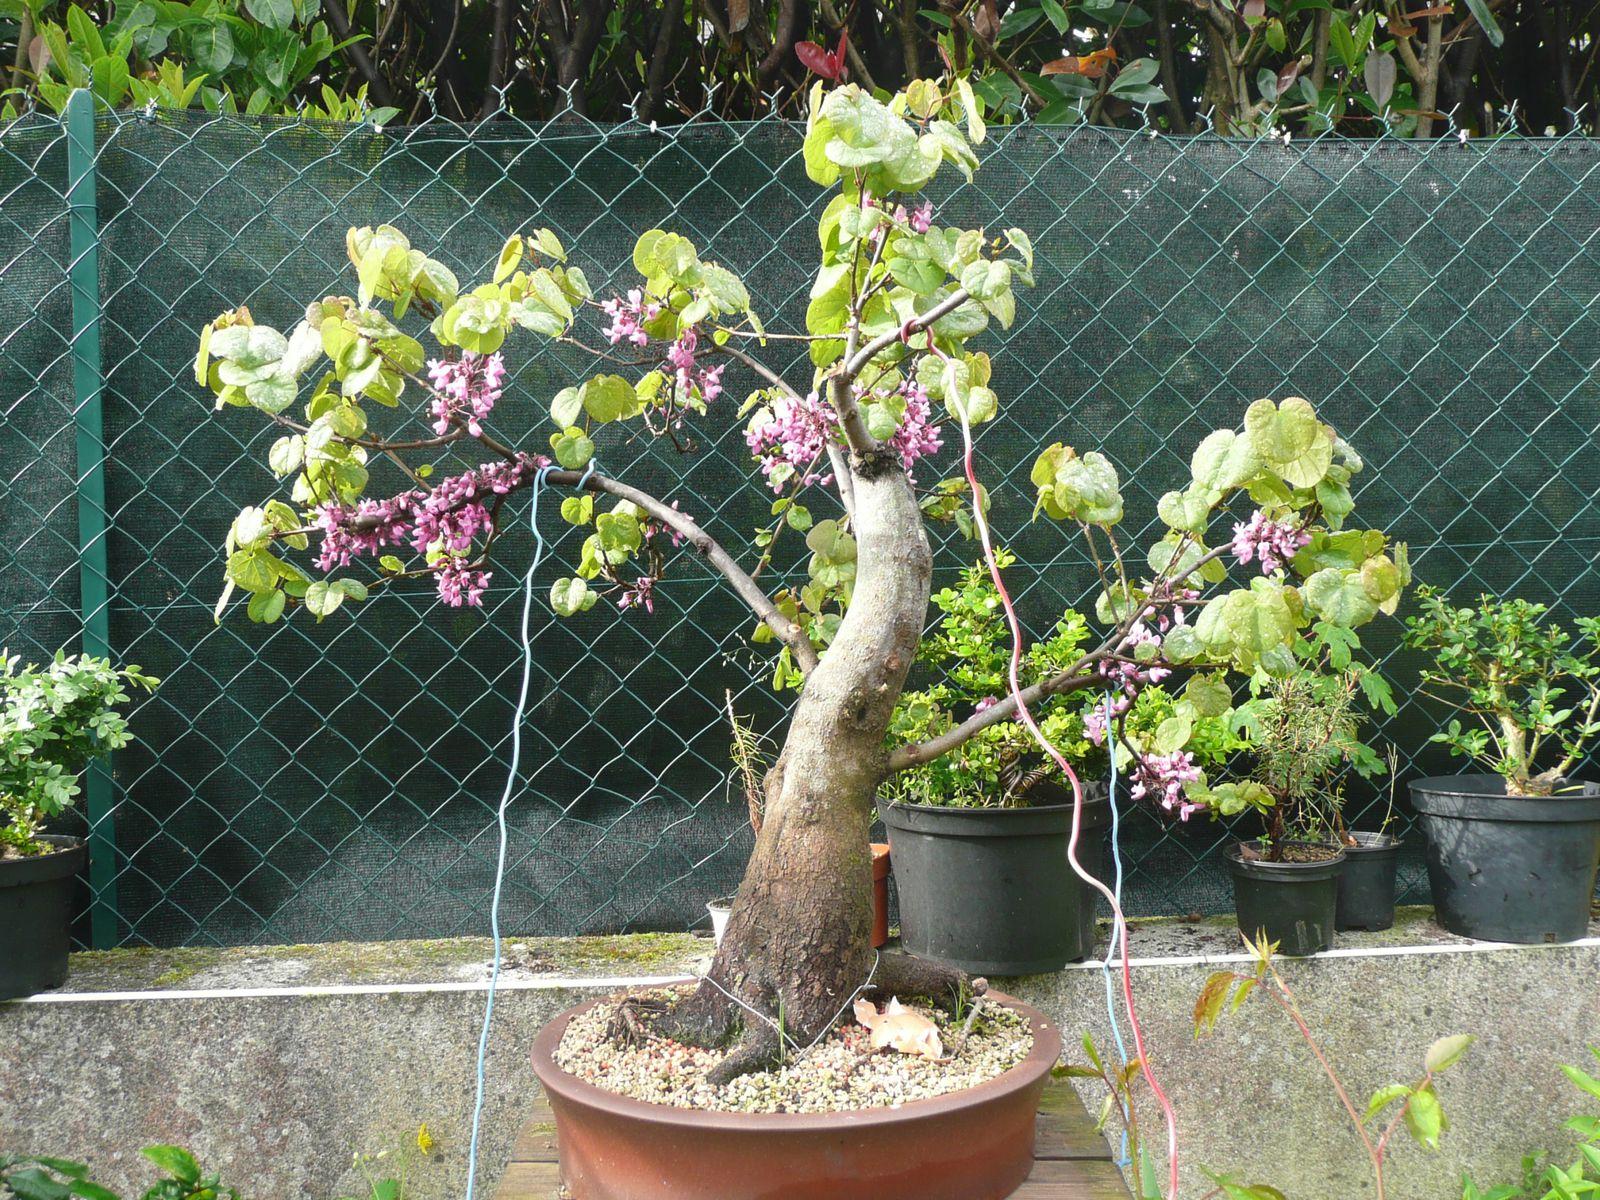 Rempotage cercis siliquastrum arbre de jud e armand bonsa - Arbre en pot ...